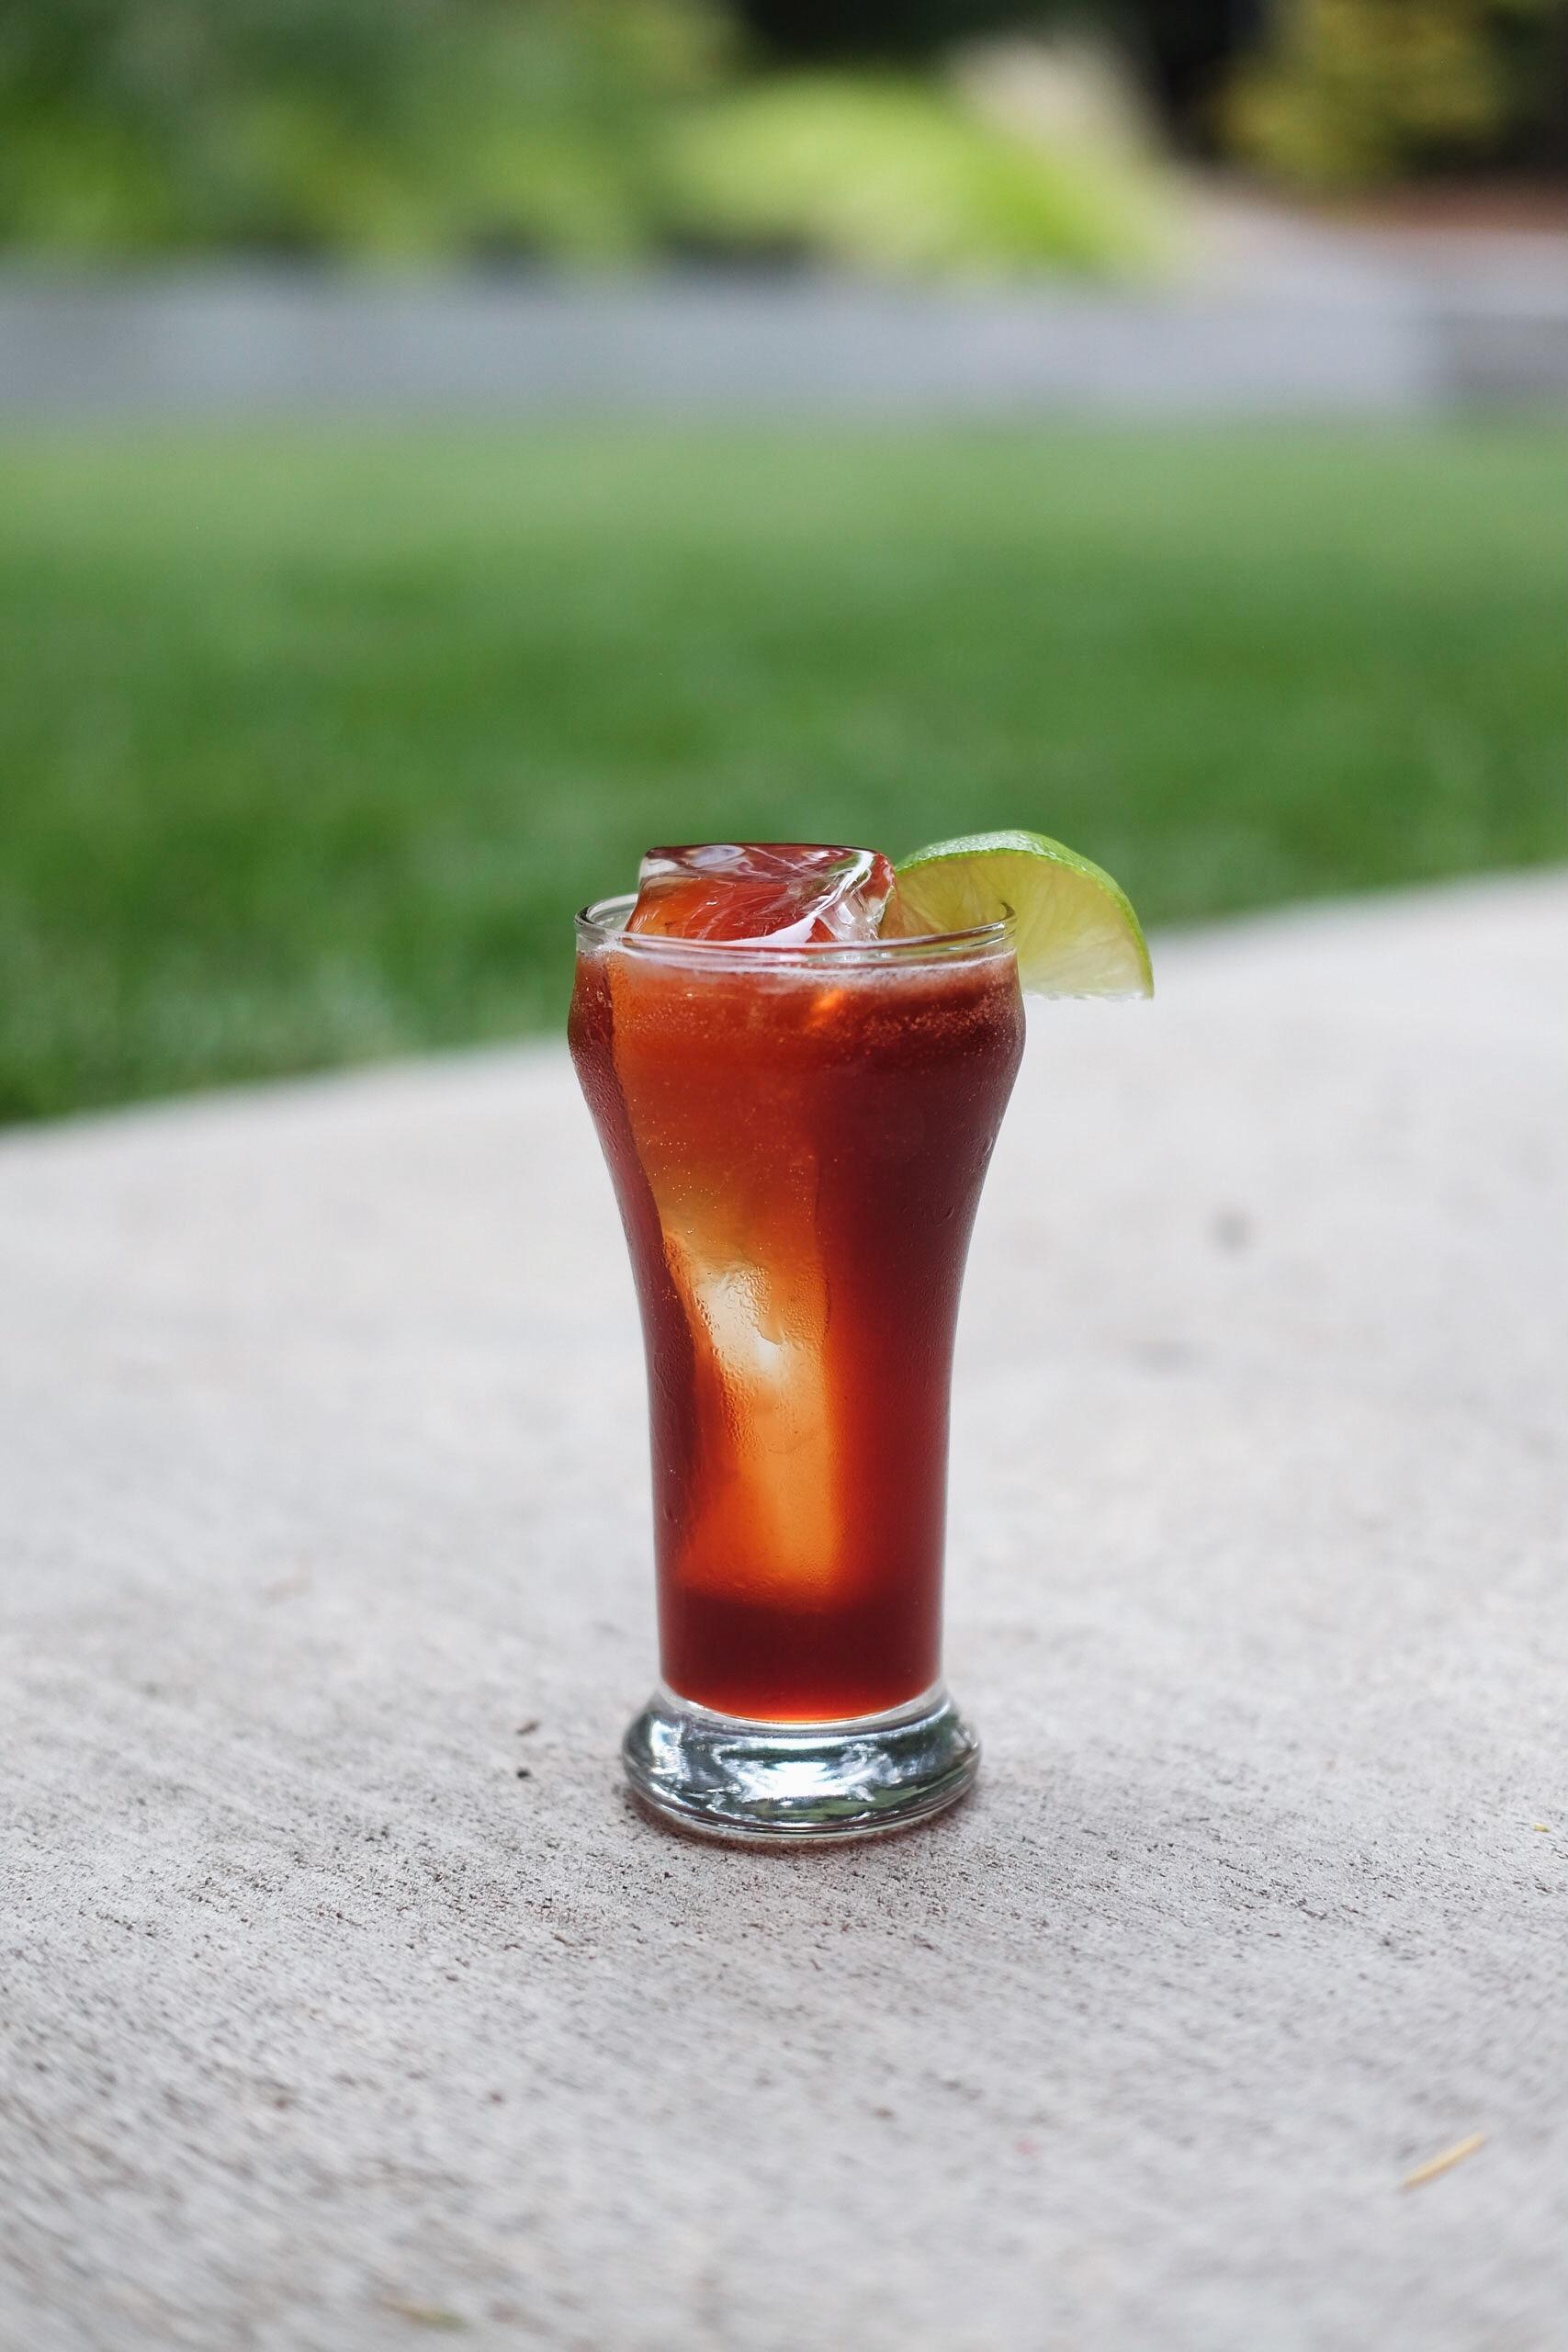 Better Than Cherry Coke - 1½ oz Dark Sweet Cherry-infused Vodka¾ oz vintage cola syrup½ oz fresh lime juicesoda water